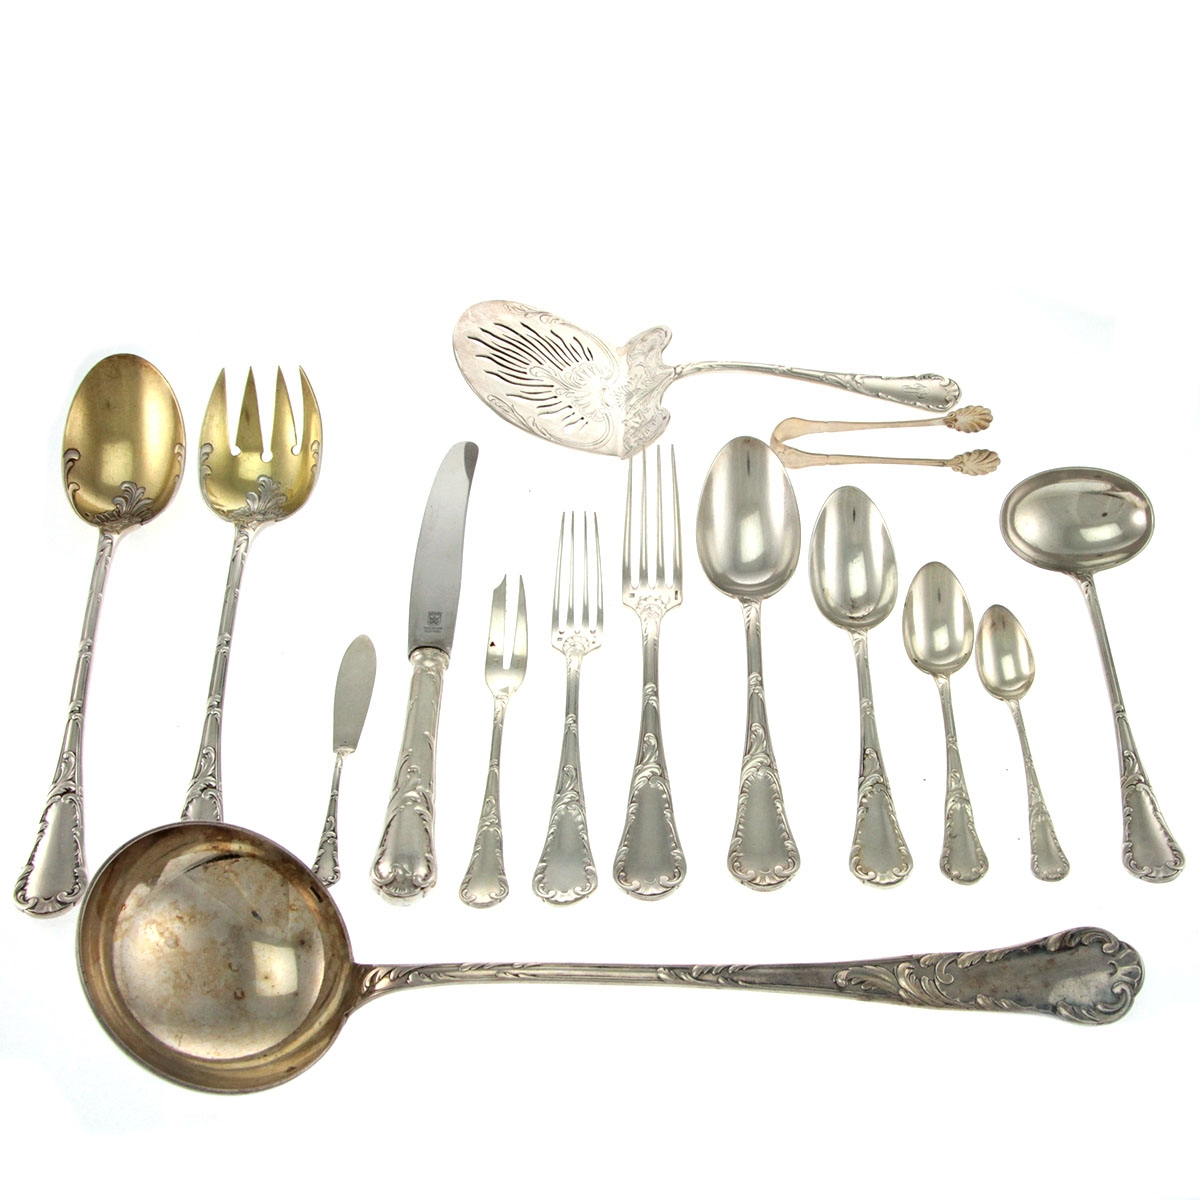 christofle 83pcs silver plated flatware cutlery set paris. Black Bedroom Furniture Sets. Home Design Ideas